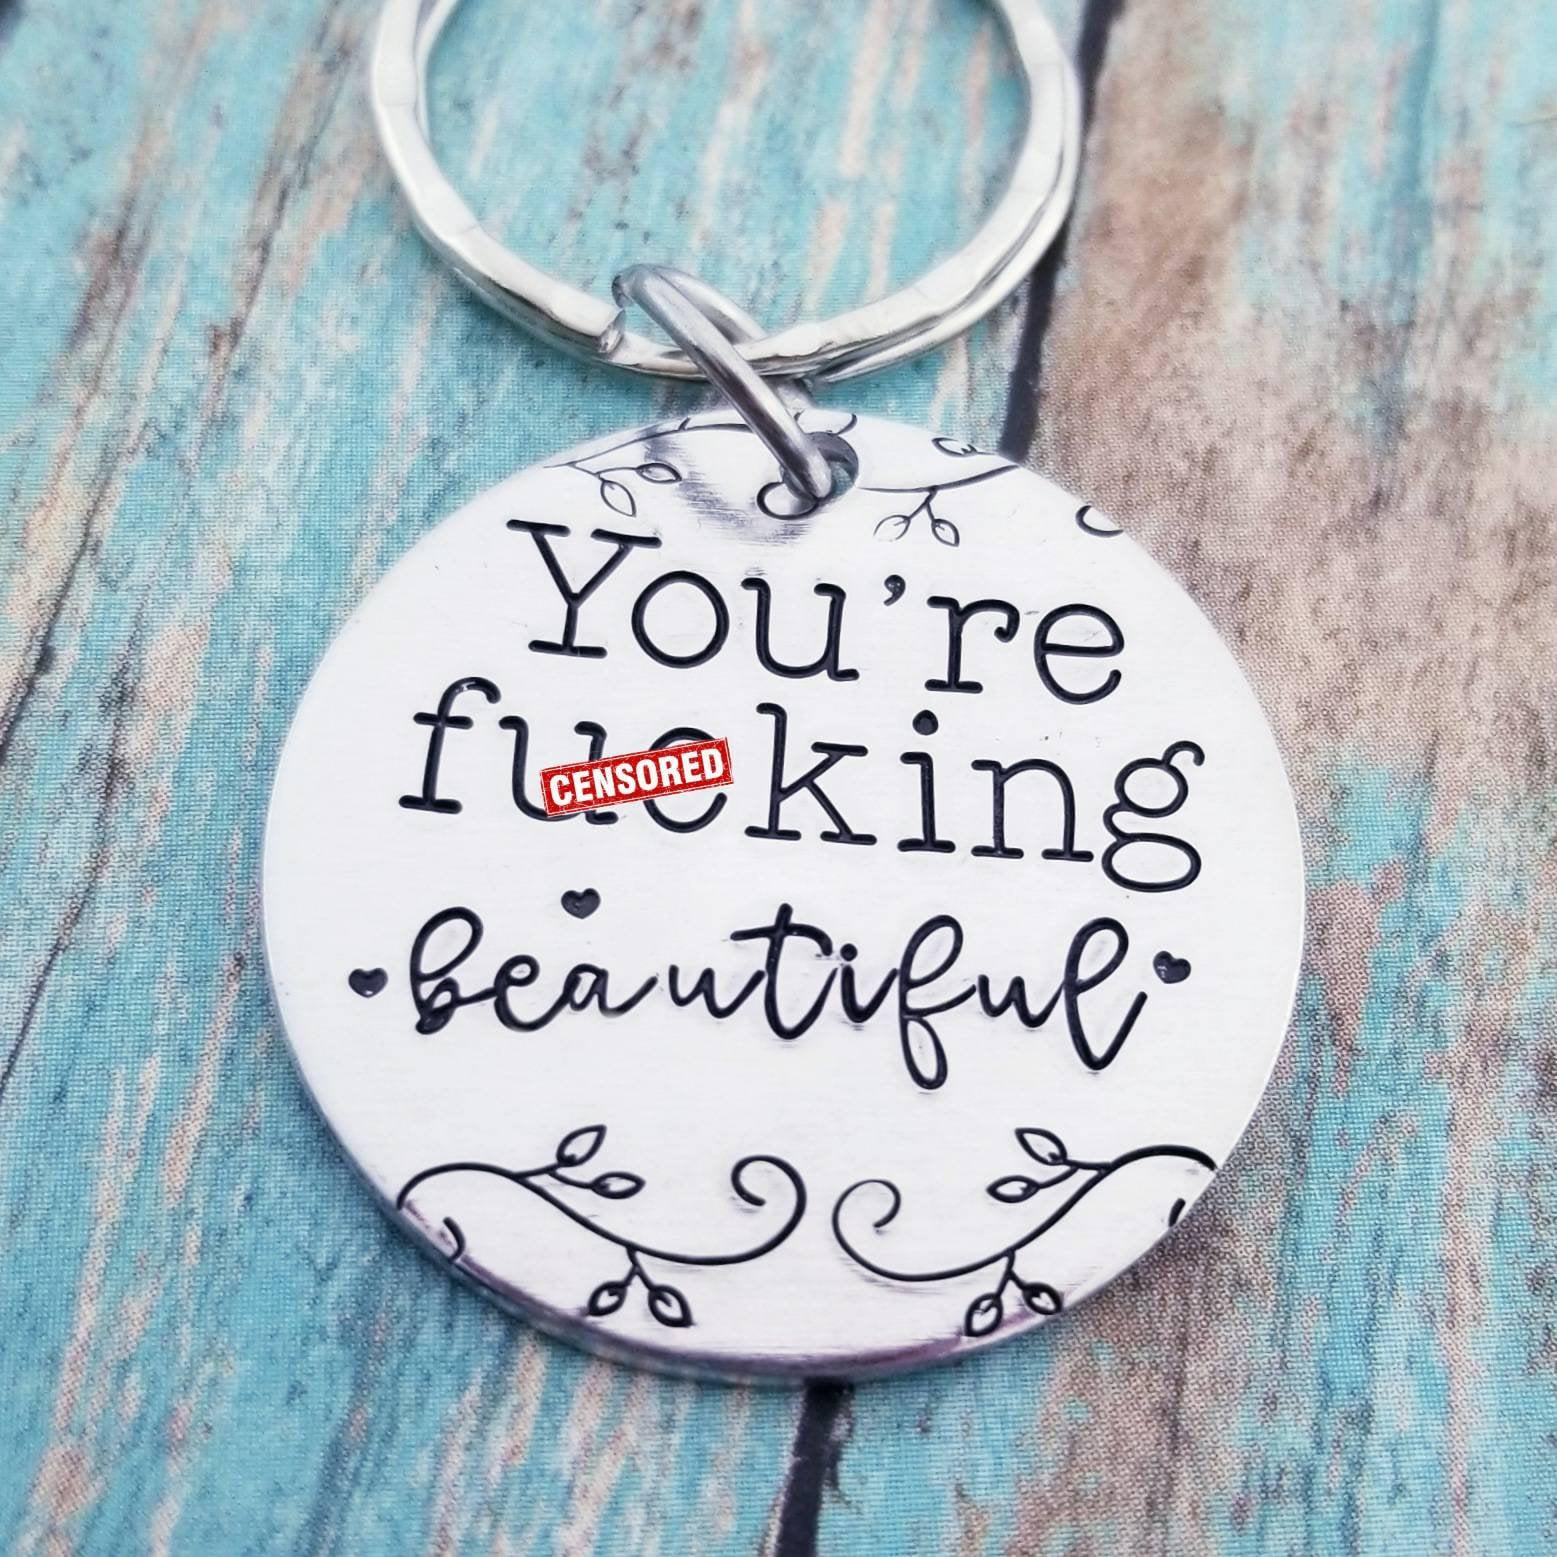 best friend mature fuck pick me up inspirational gift funny gift friend gift rude Ray of fucking sunshine keychain girlfriend gift